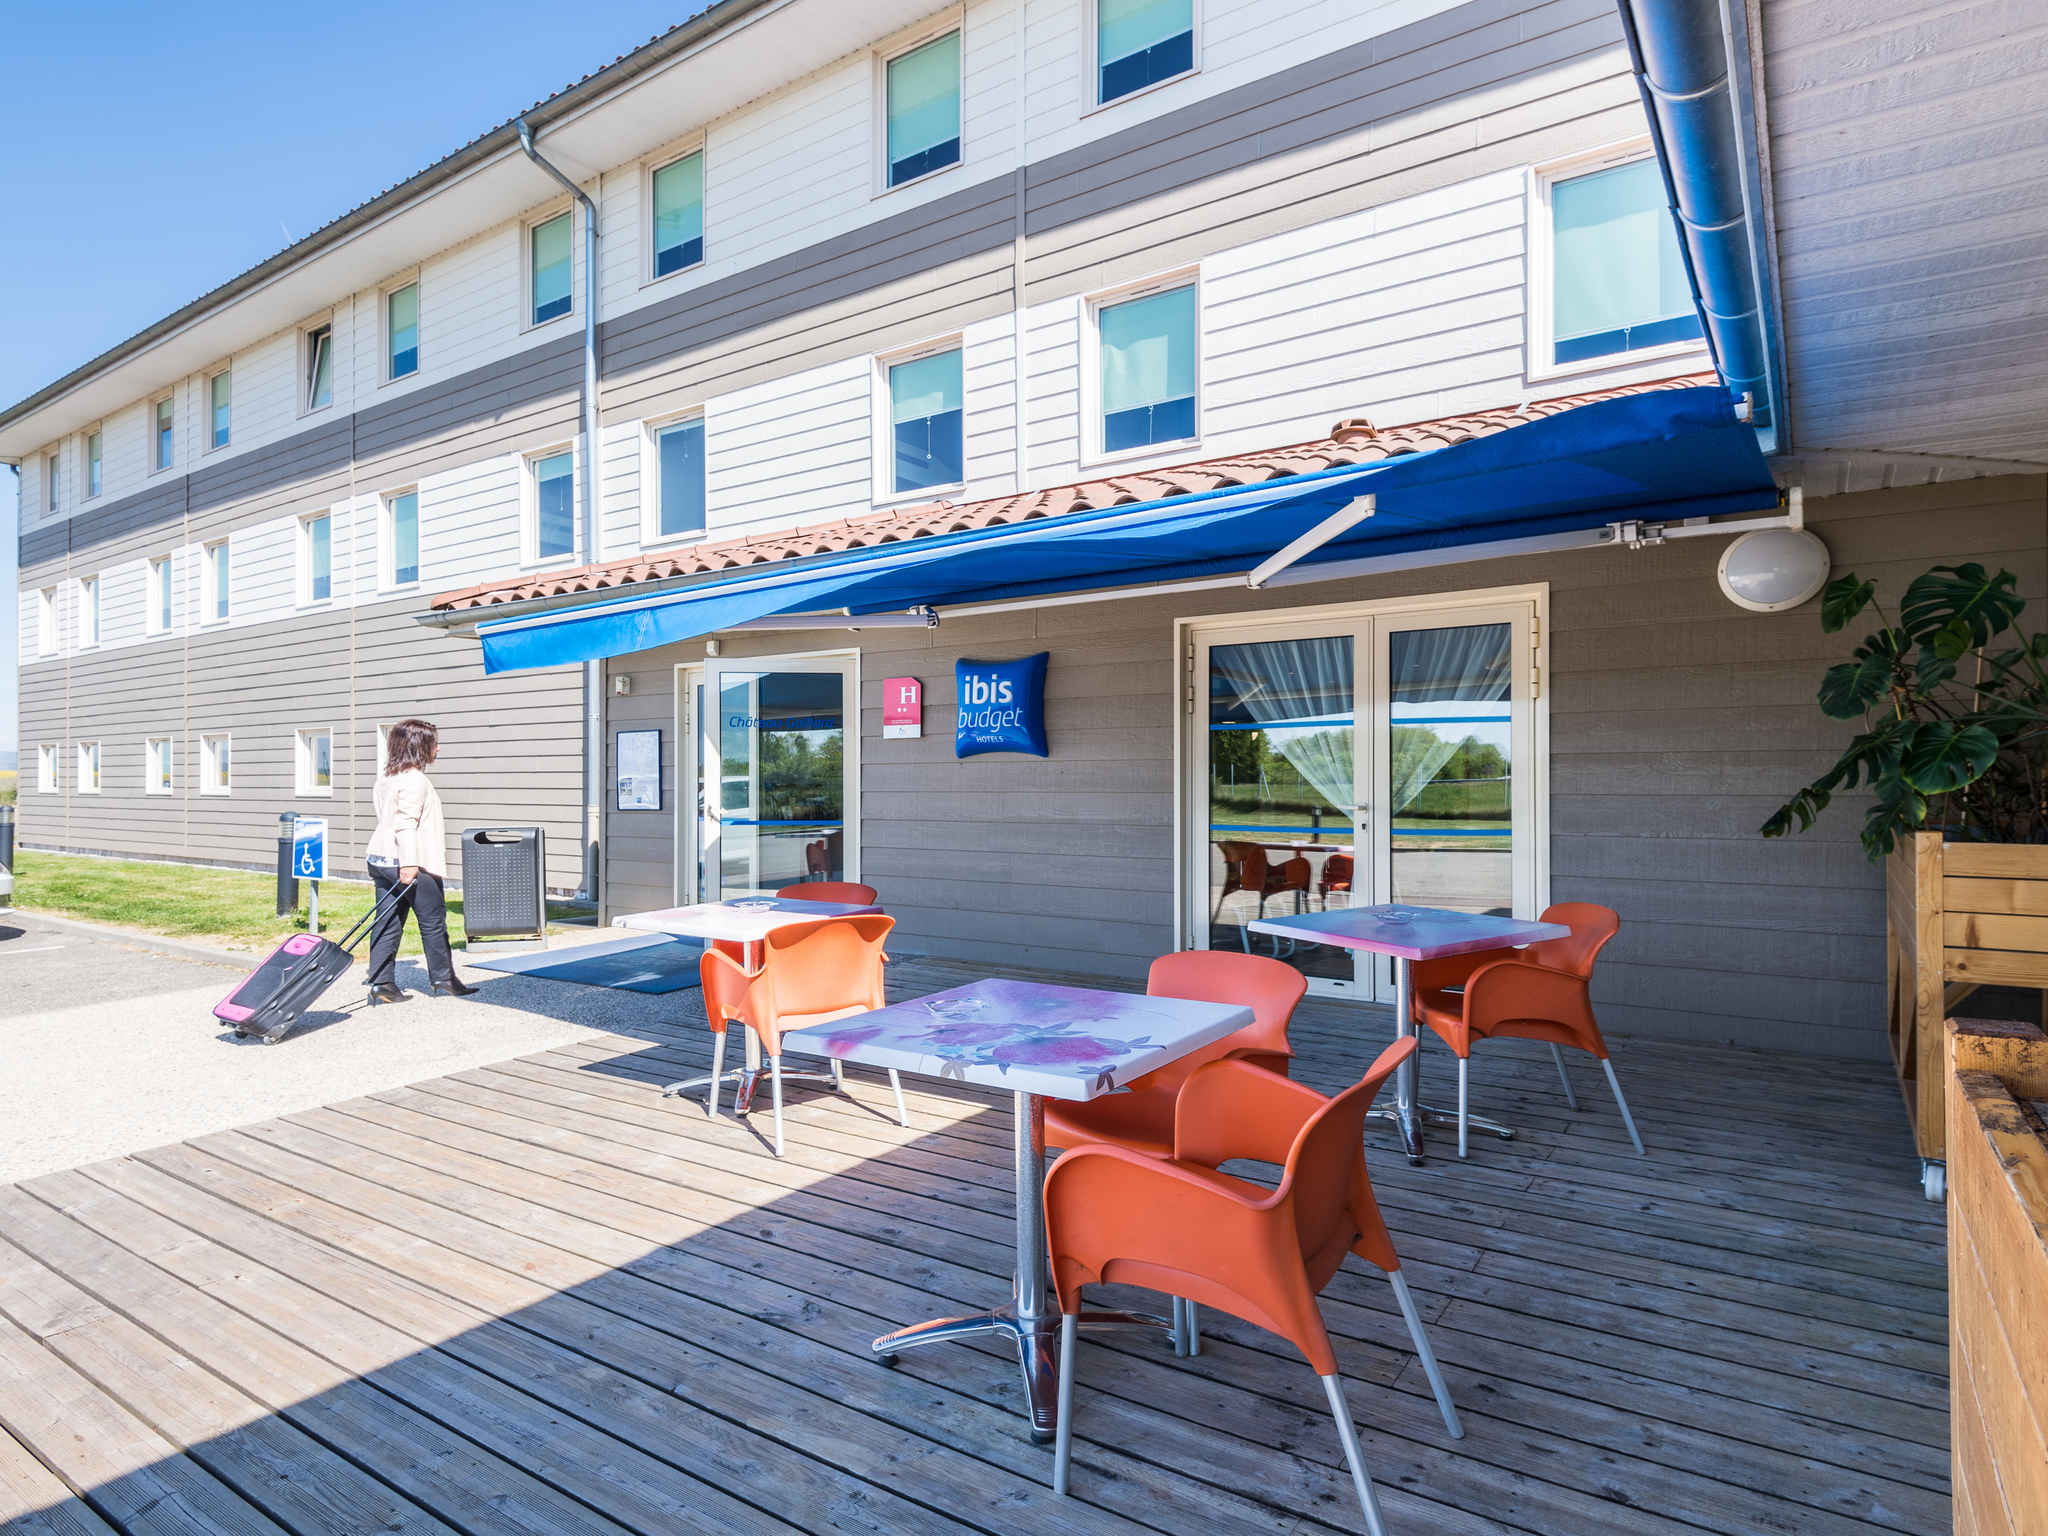 Hotel - IBIS BUDGET AMBERIEU EN BUGEY CHATEAU GAILLARD